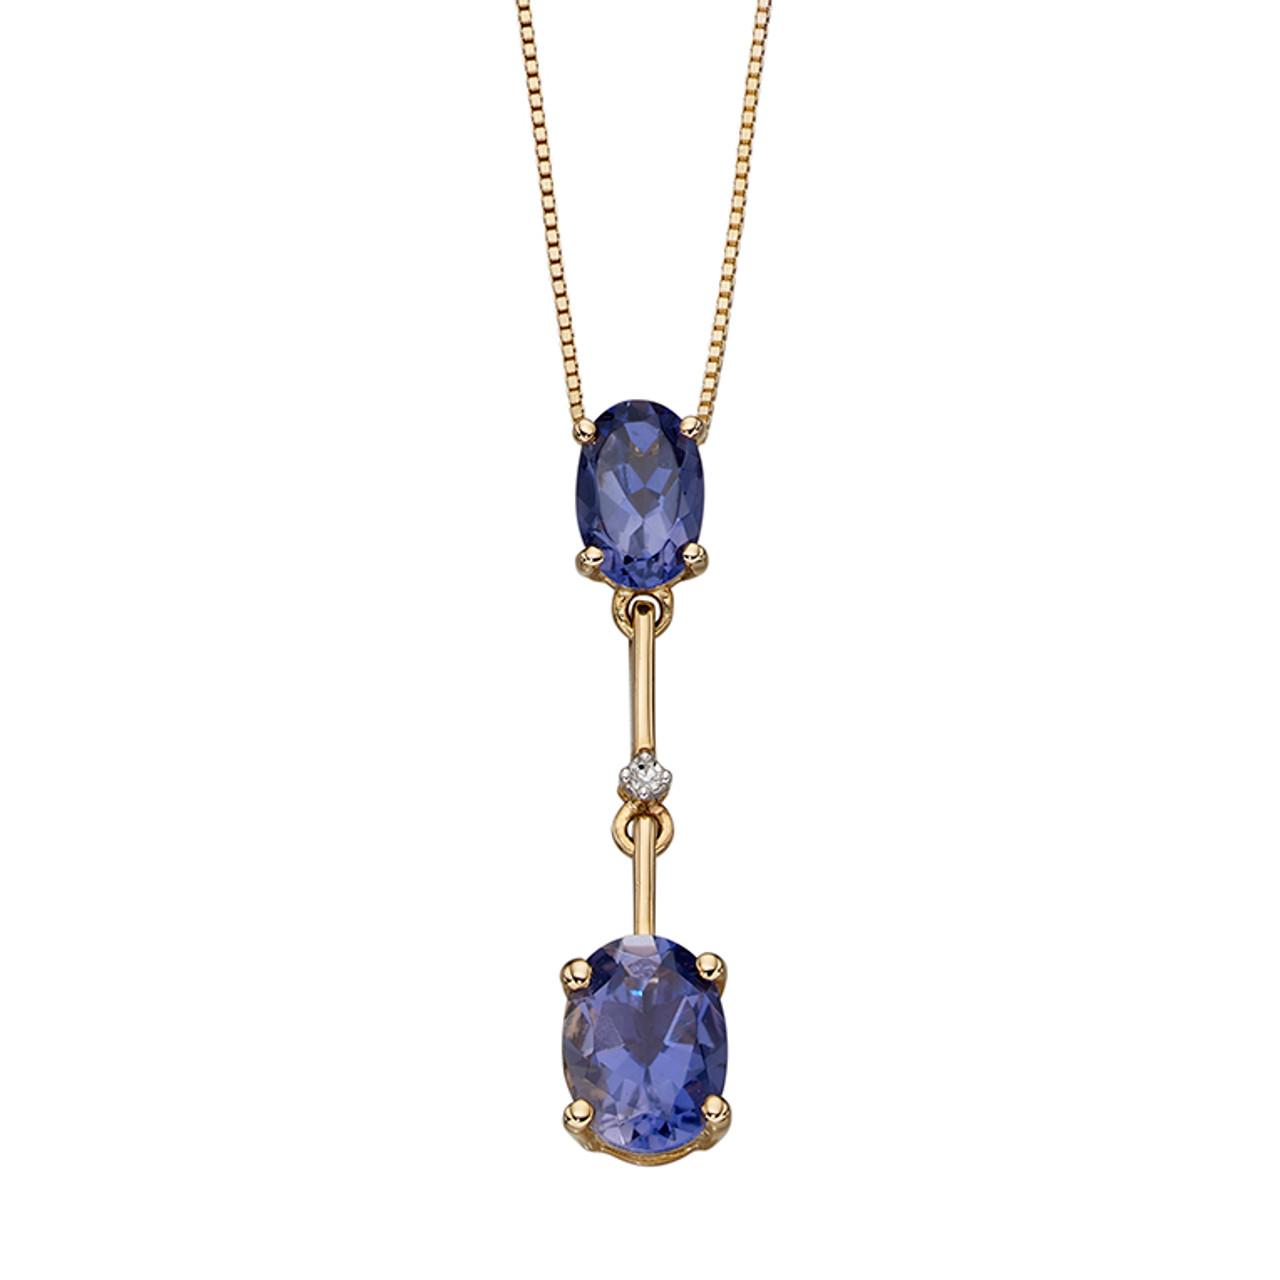 9ct Yellow Gold Iolite & Diamond Pendant on Chain